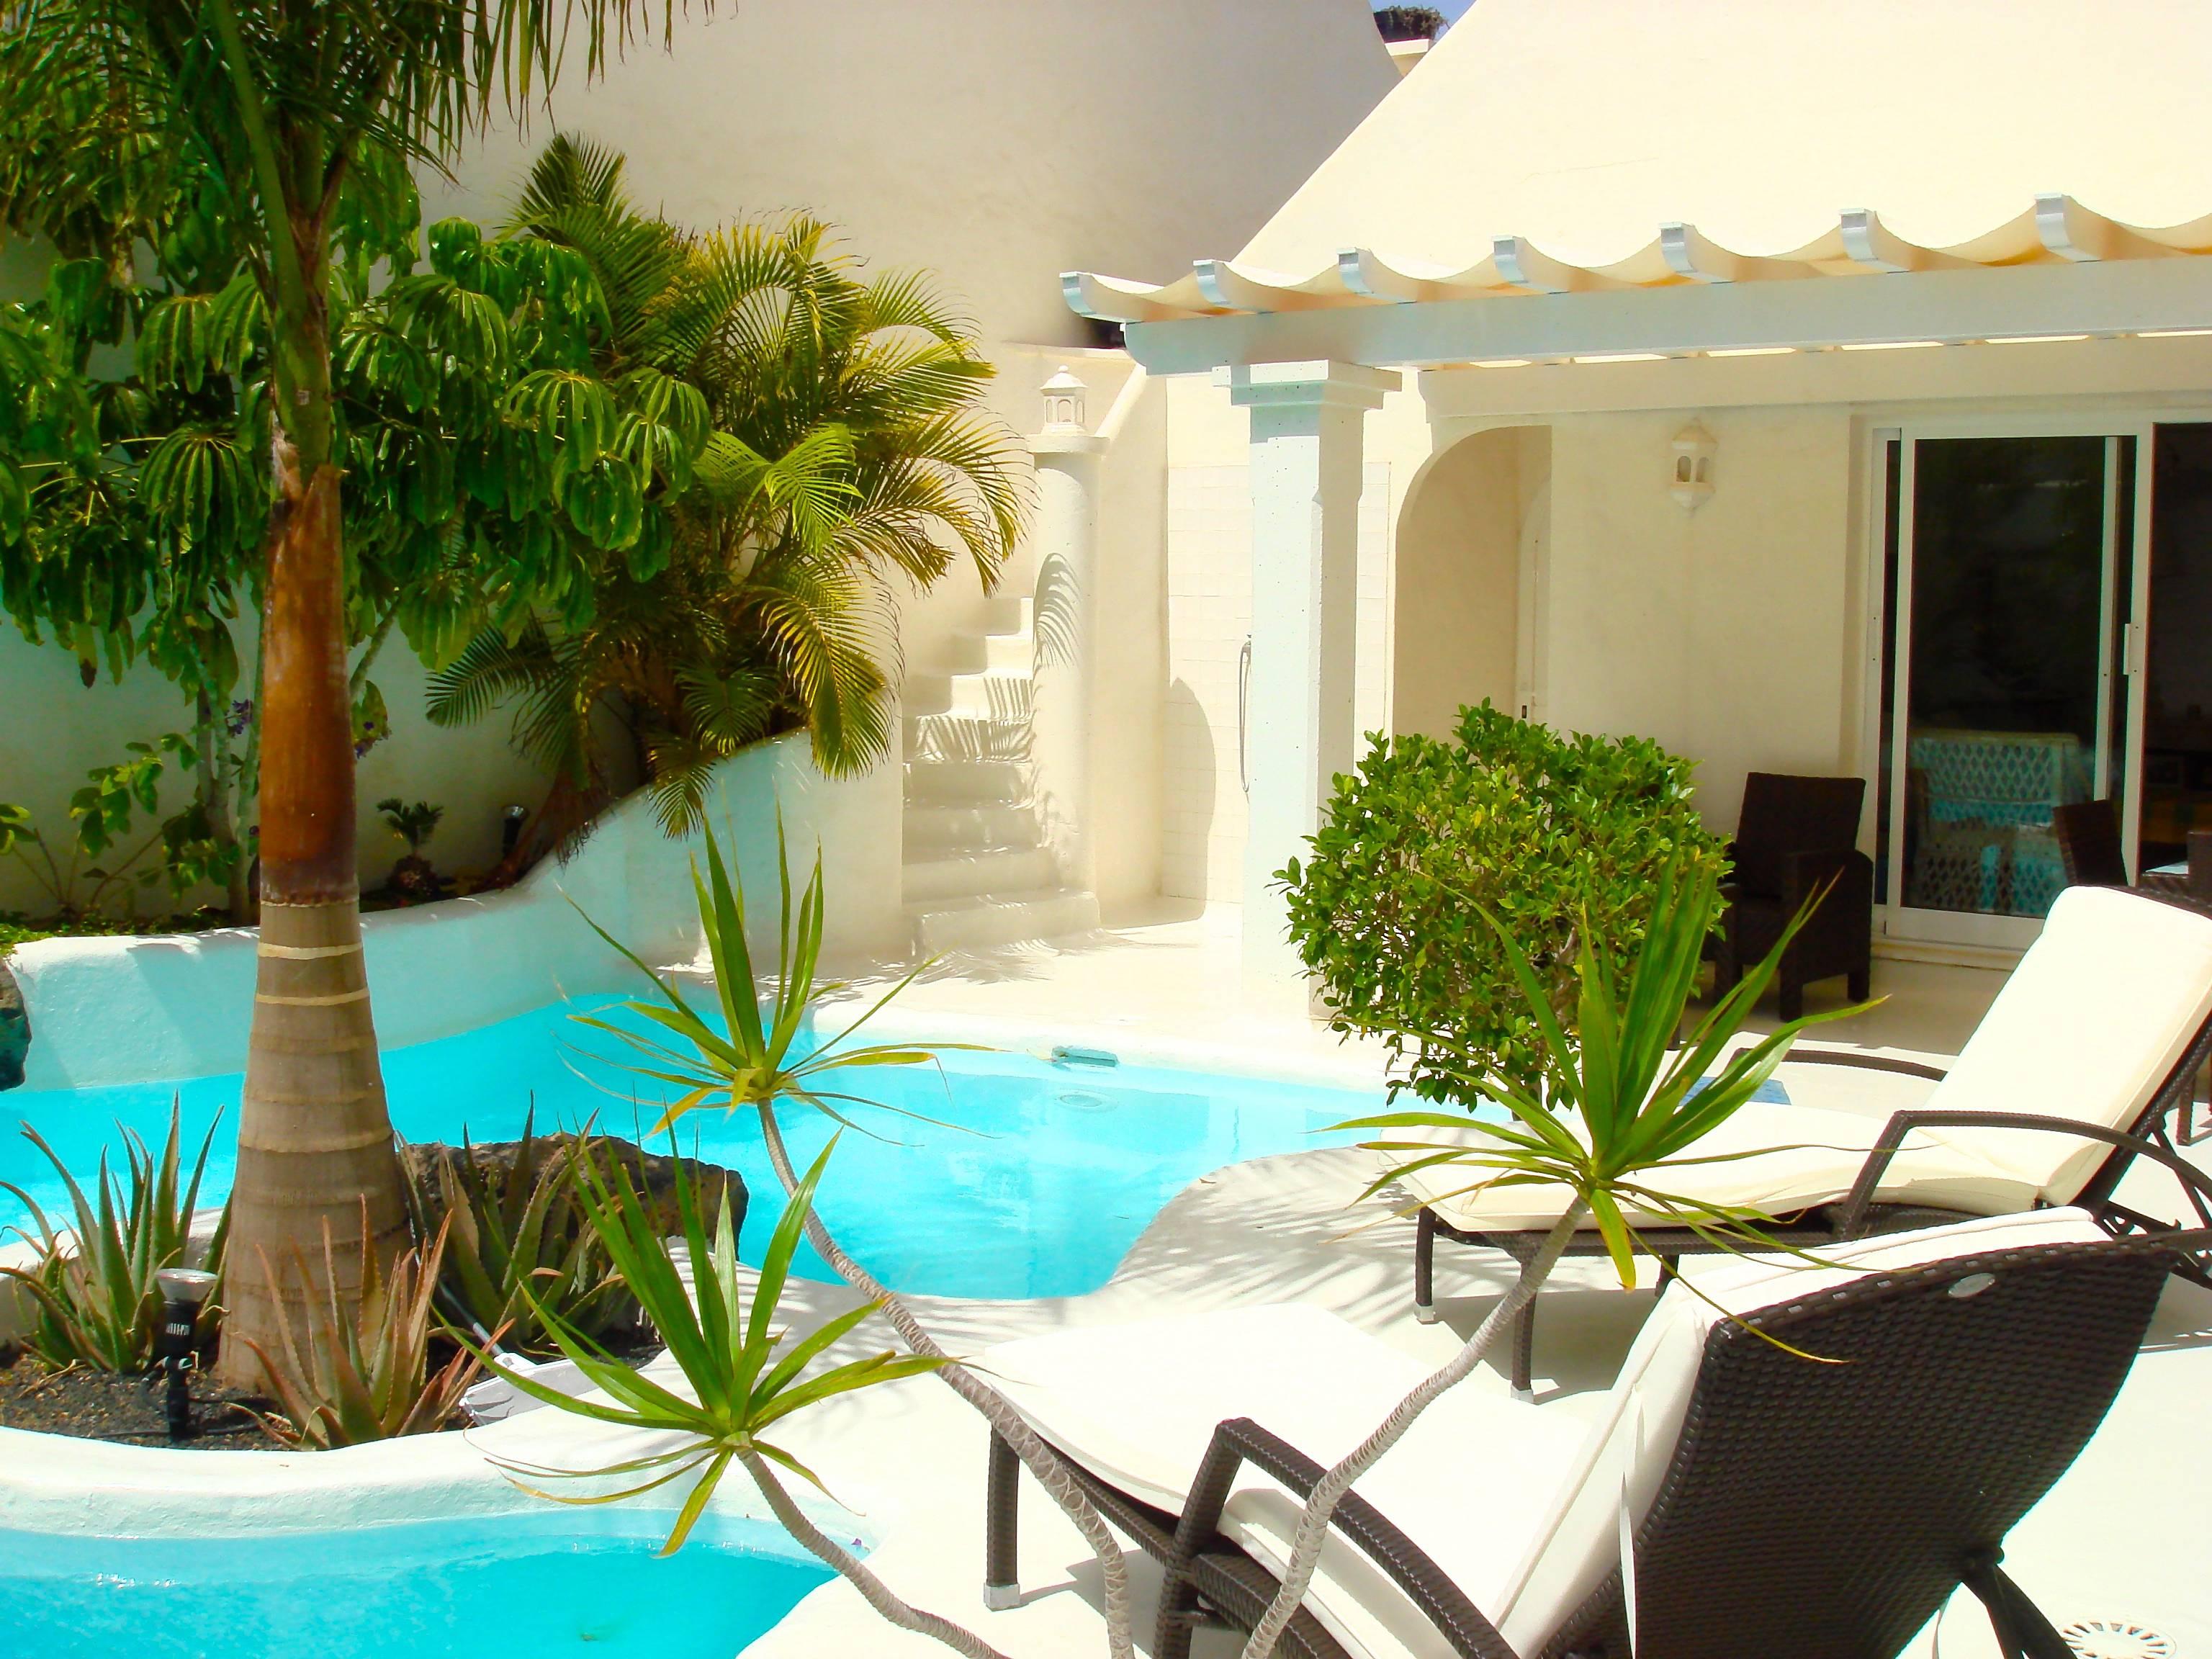 Villa lujo tranquila con piscina climatizada 25 c corralejo playa la oliva fuerteventura - Camping en oliva con piscina ...